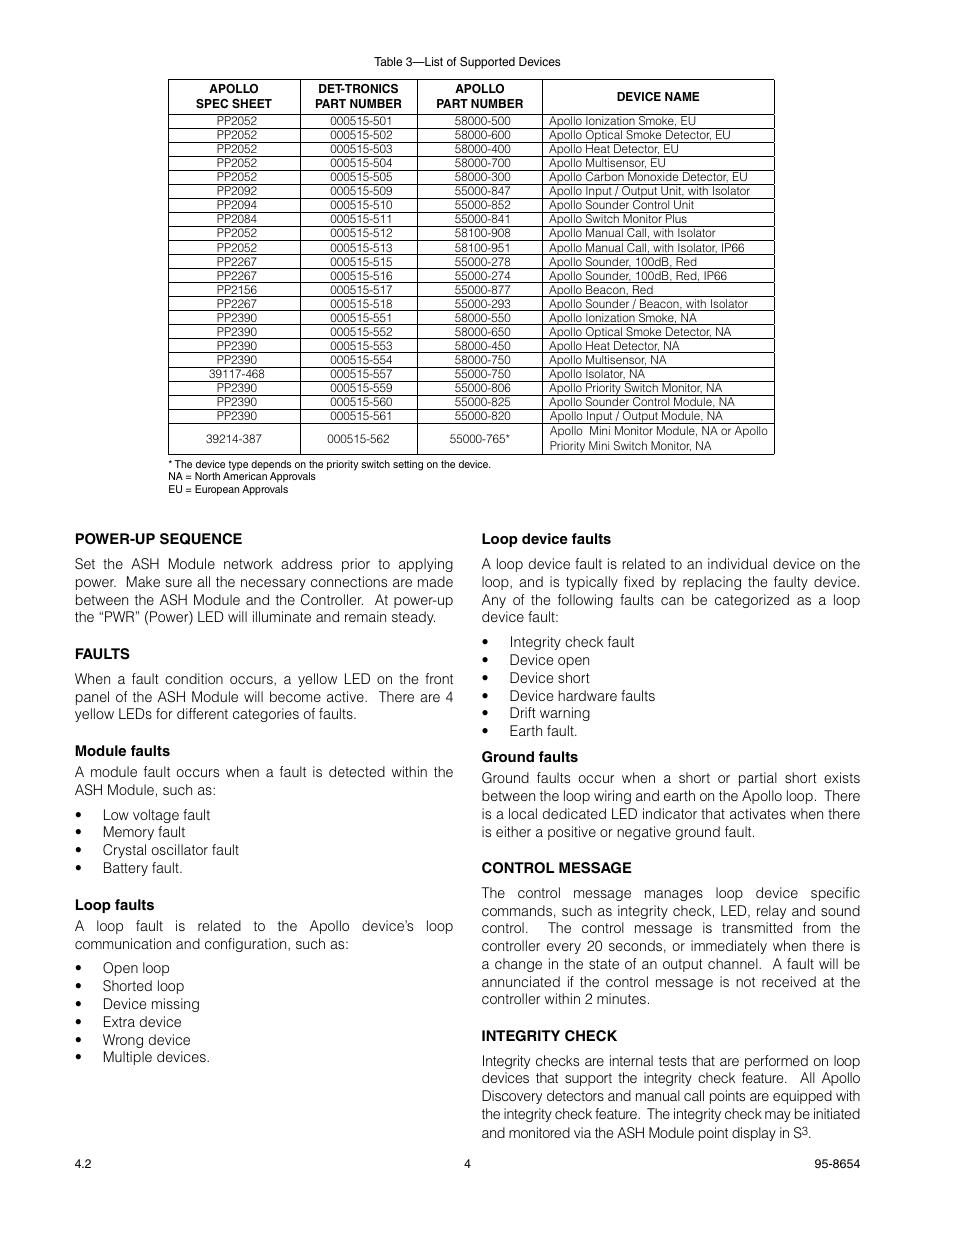 Det Tronics Eq3750ash Eqp Addressable Smoke Heat Ash Module User Apollo Detector Wiring Diagram Manual Page 4 8